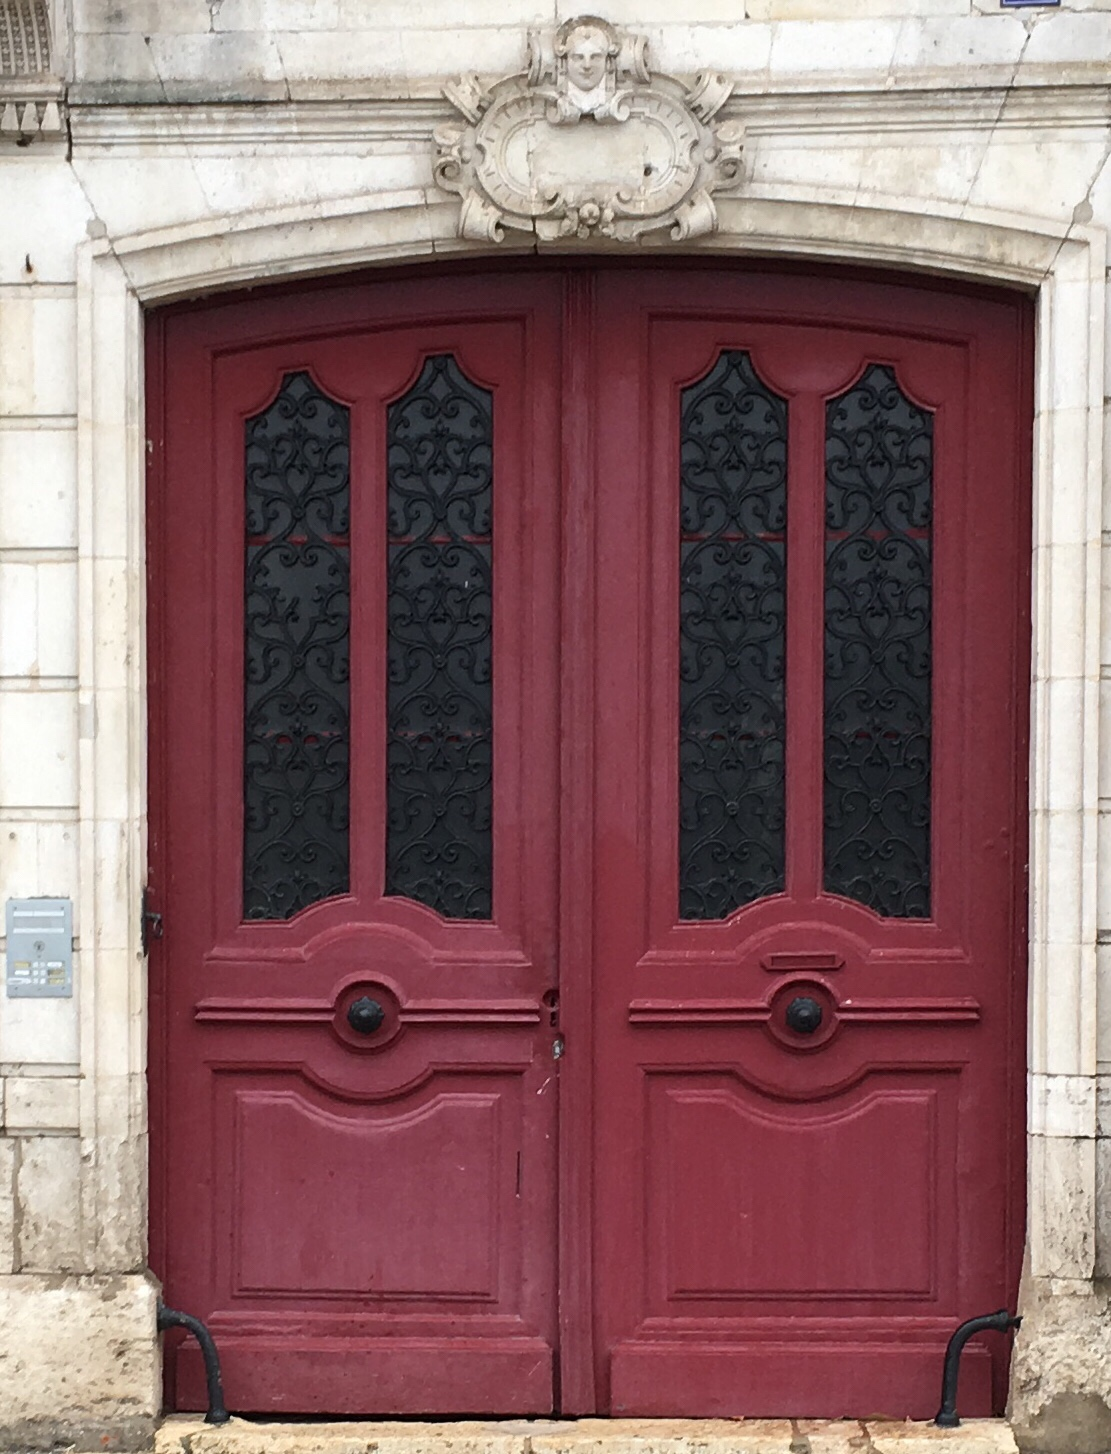 Doors in France are works of art. & The Crimson Door \u2013 La porte magenta | L o i r e D ...